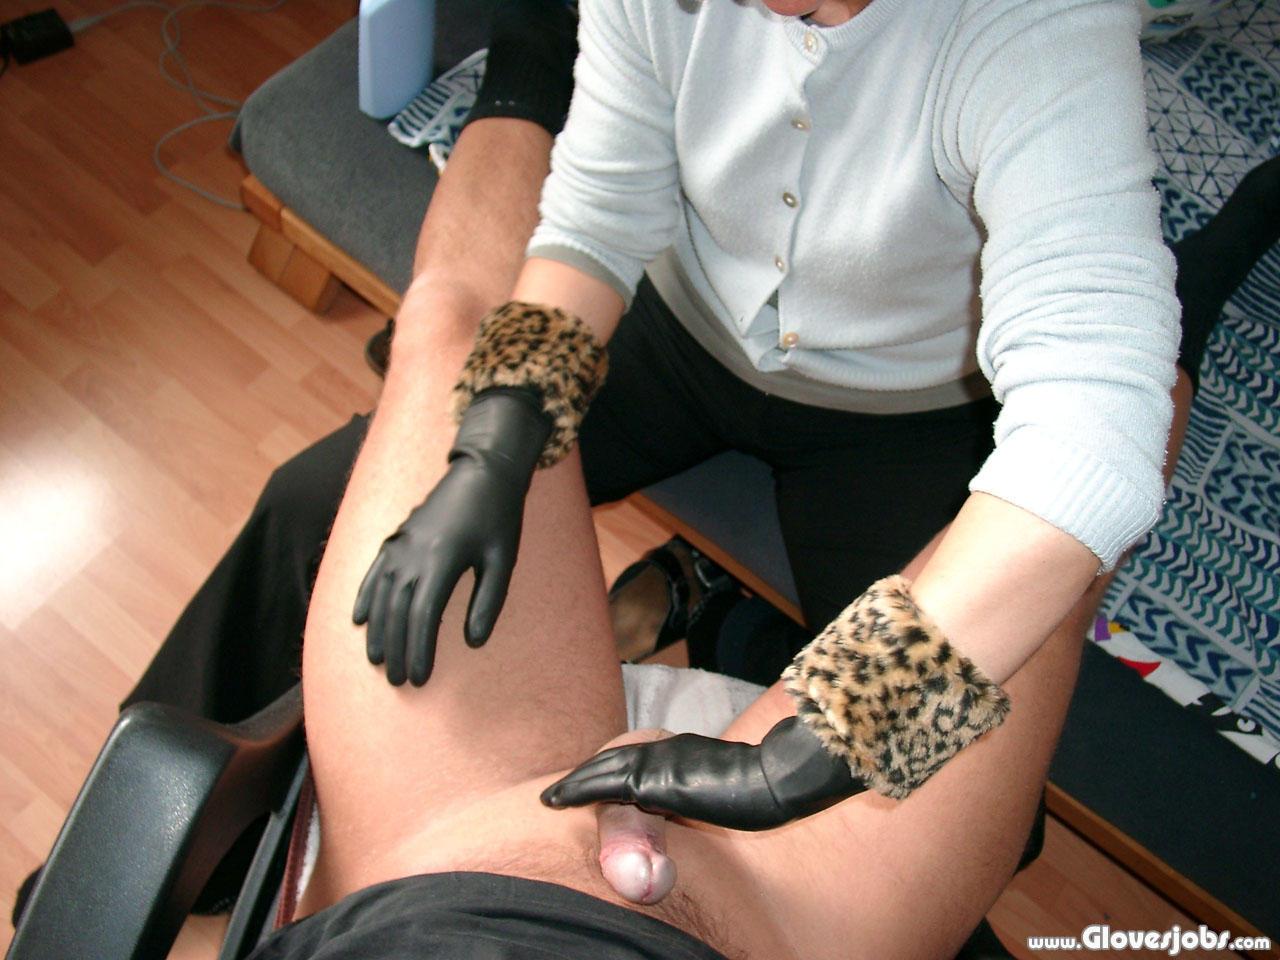 Milking handjob rubber glove mistress illusion 4